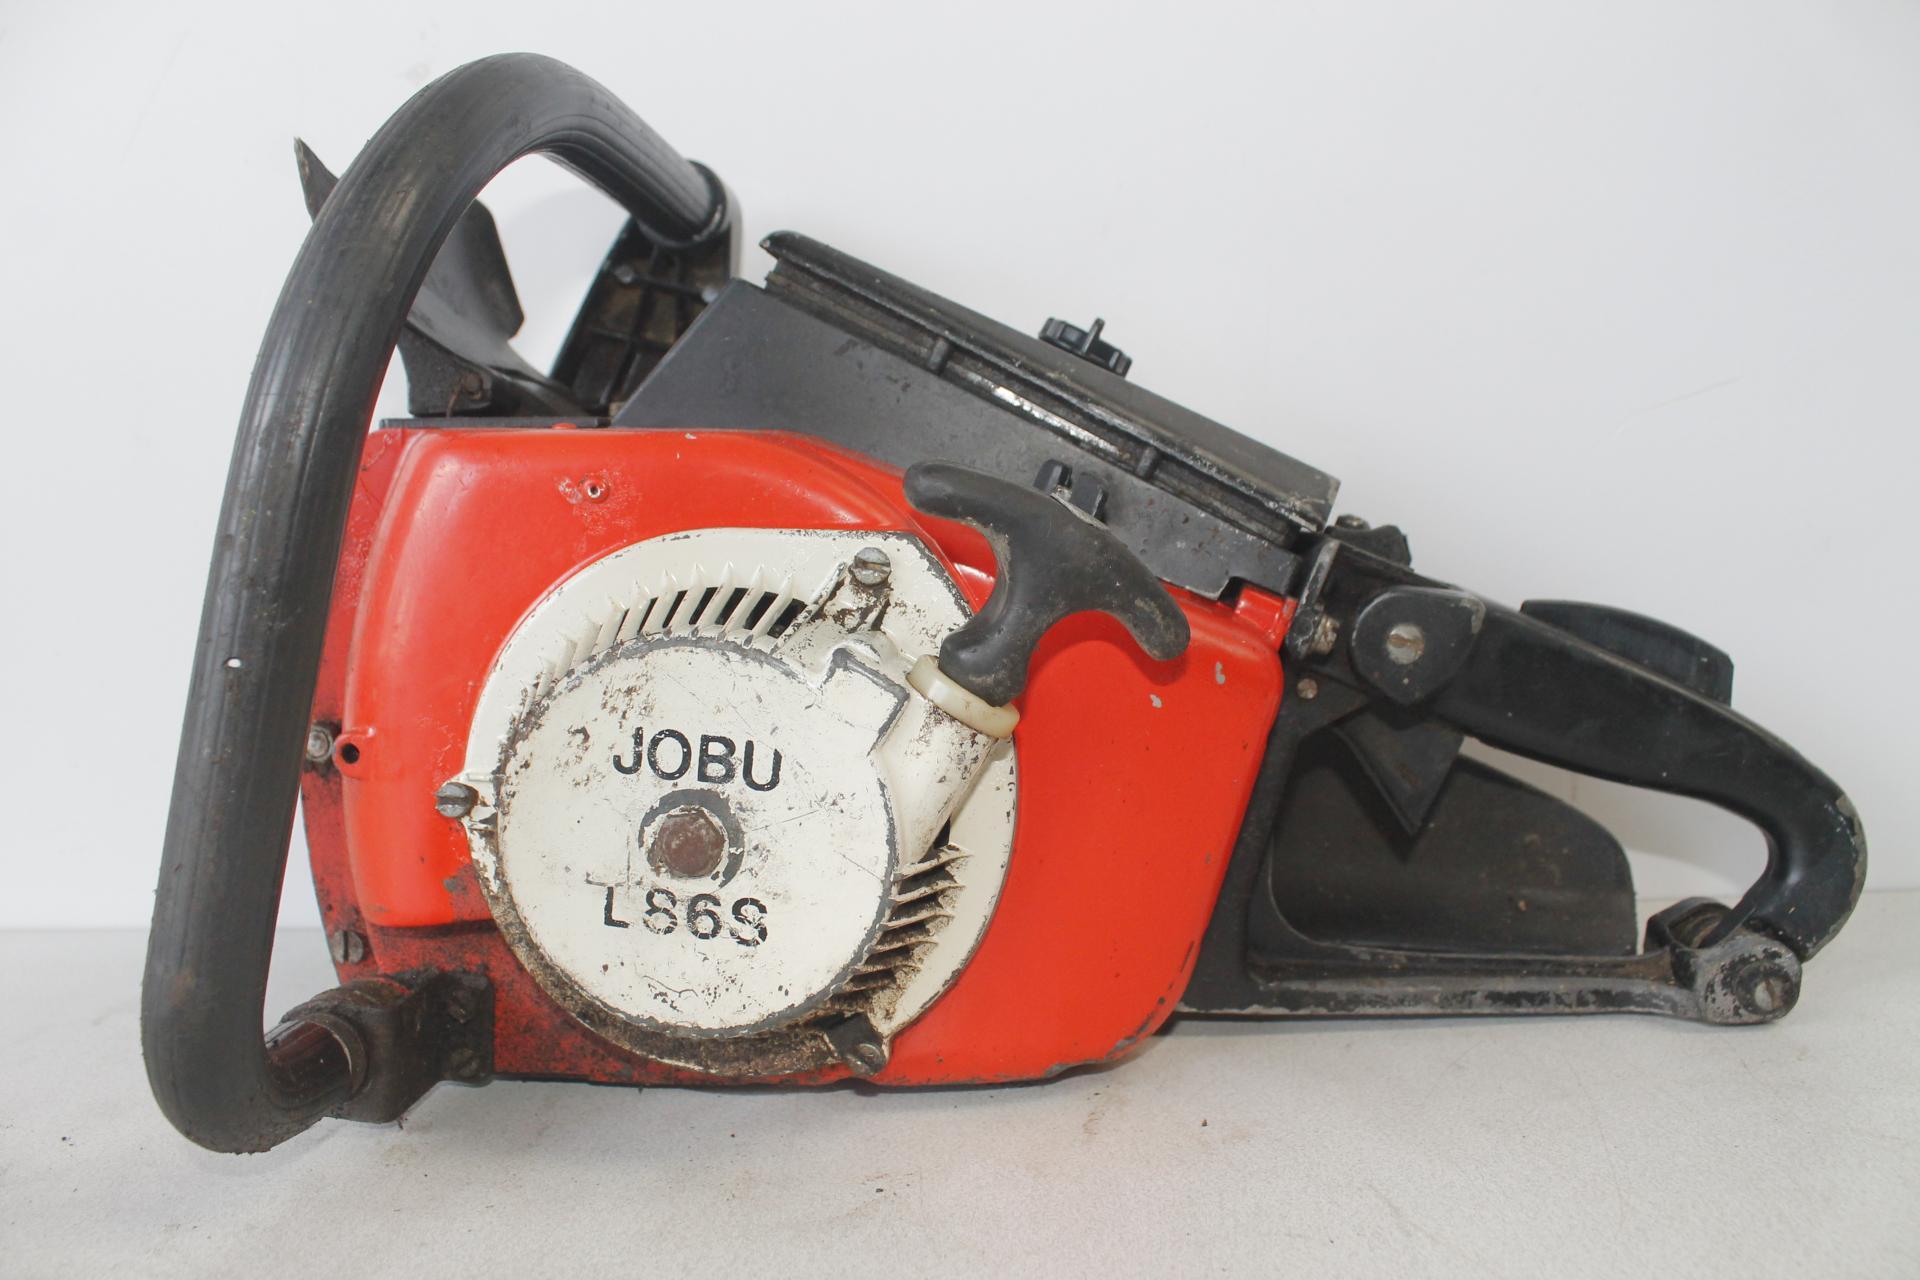 Despiece JOBU L86s